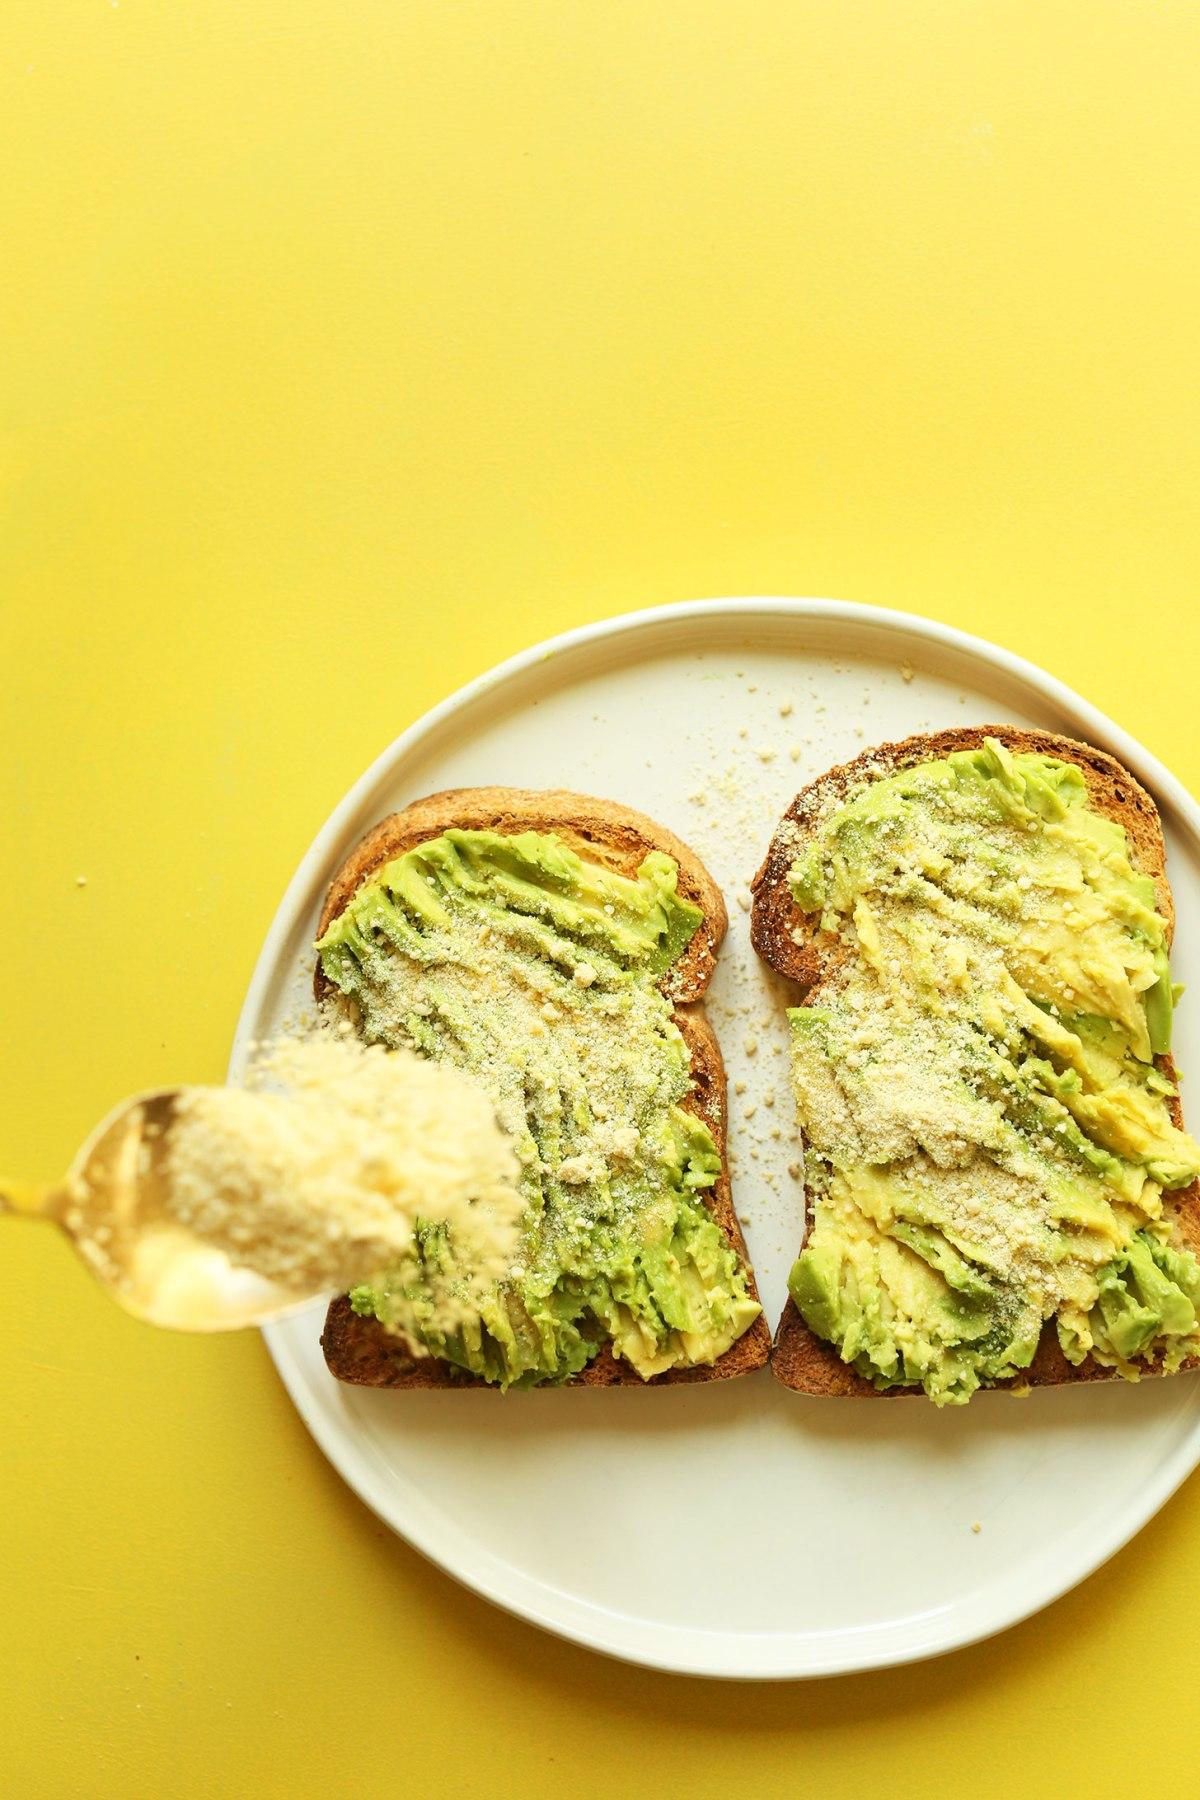 My-GO-TO-Avocado-Toast-5-minutes-3-ingredients-SO-delicious-vegan-glutenfree-avocado-recipe-easy.jpg